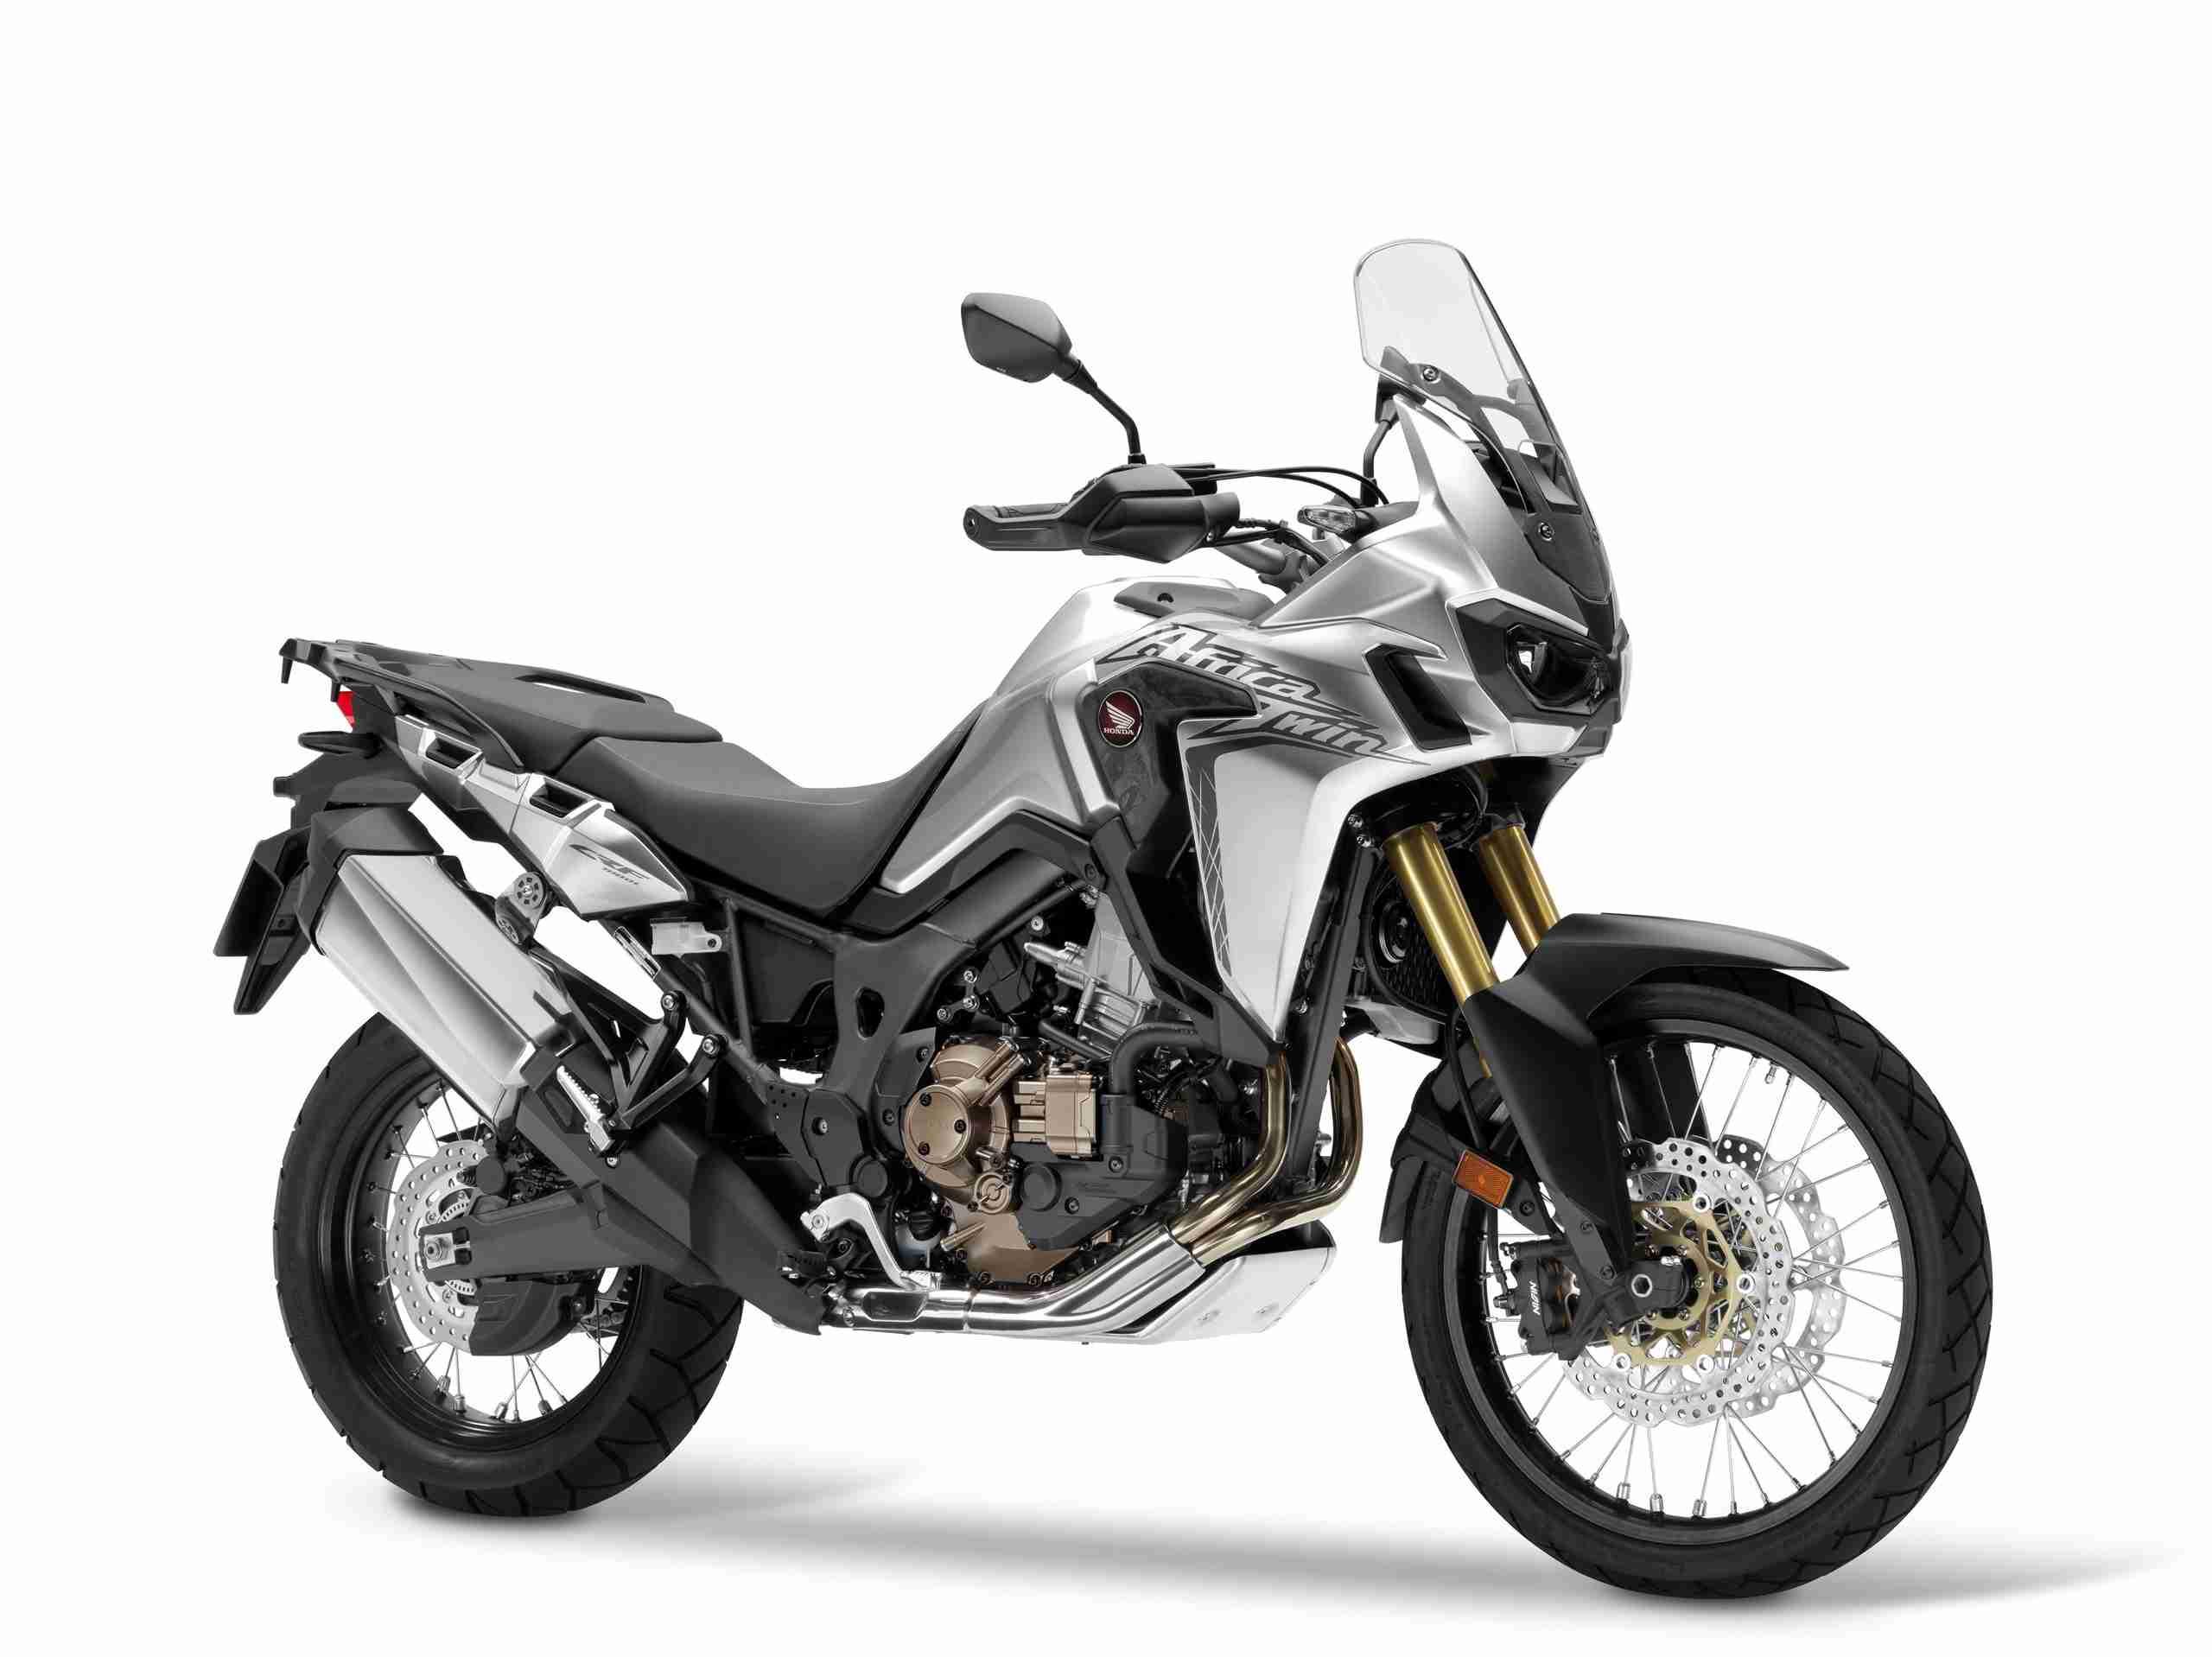 2016 Honda CRF1000L Africa Twin